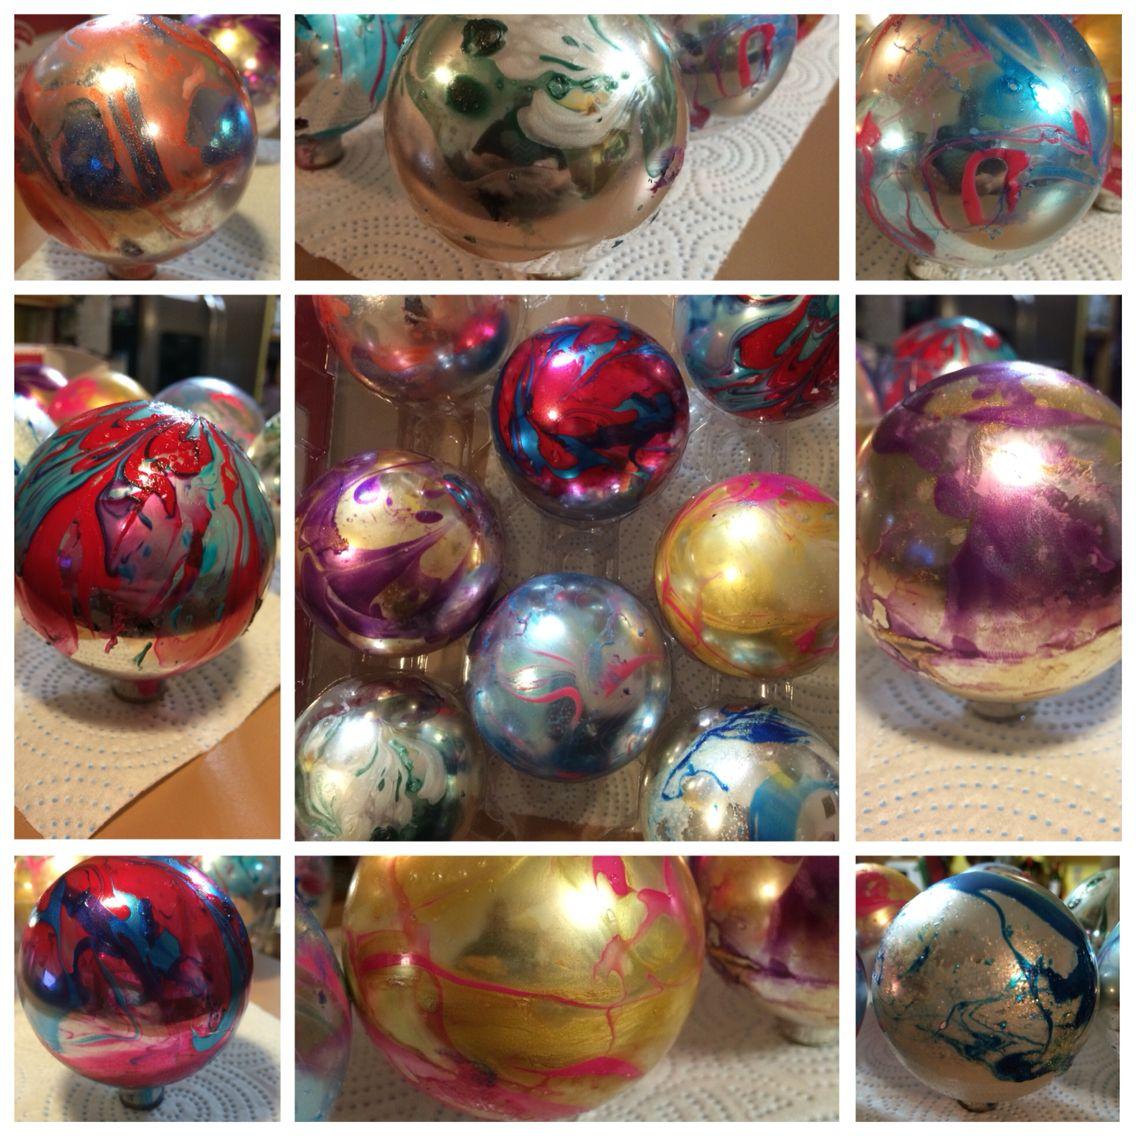 Nail Polish Christmas Ornaments Lukewarm Water Drizzle 2 Or More